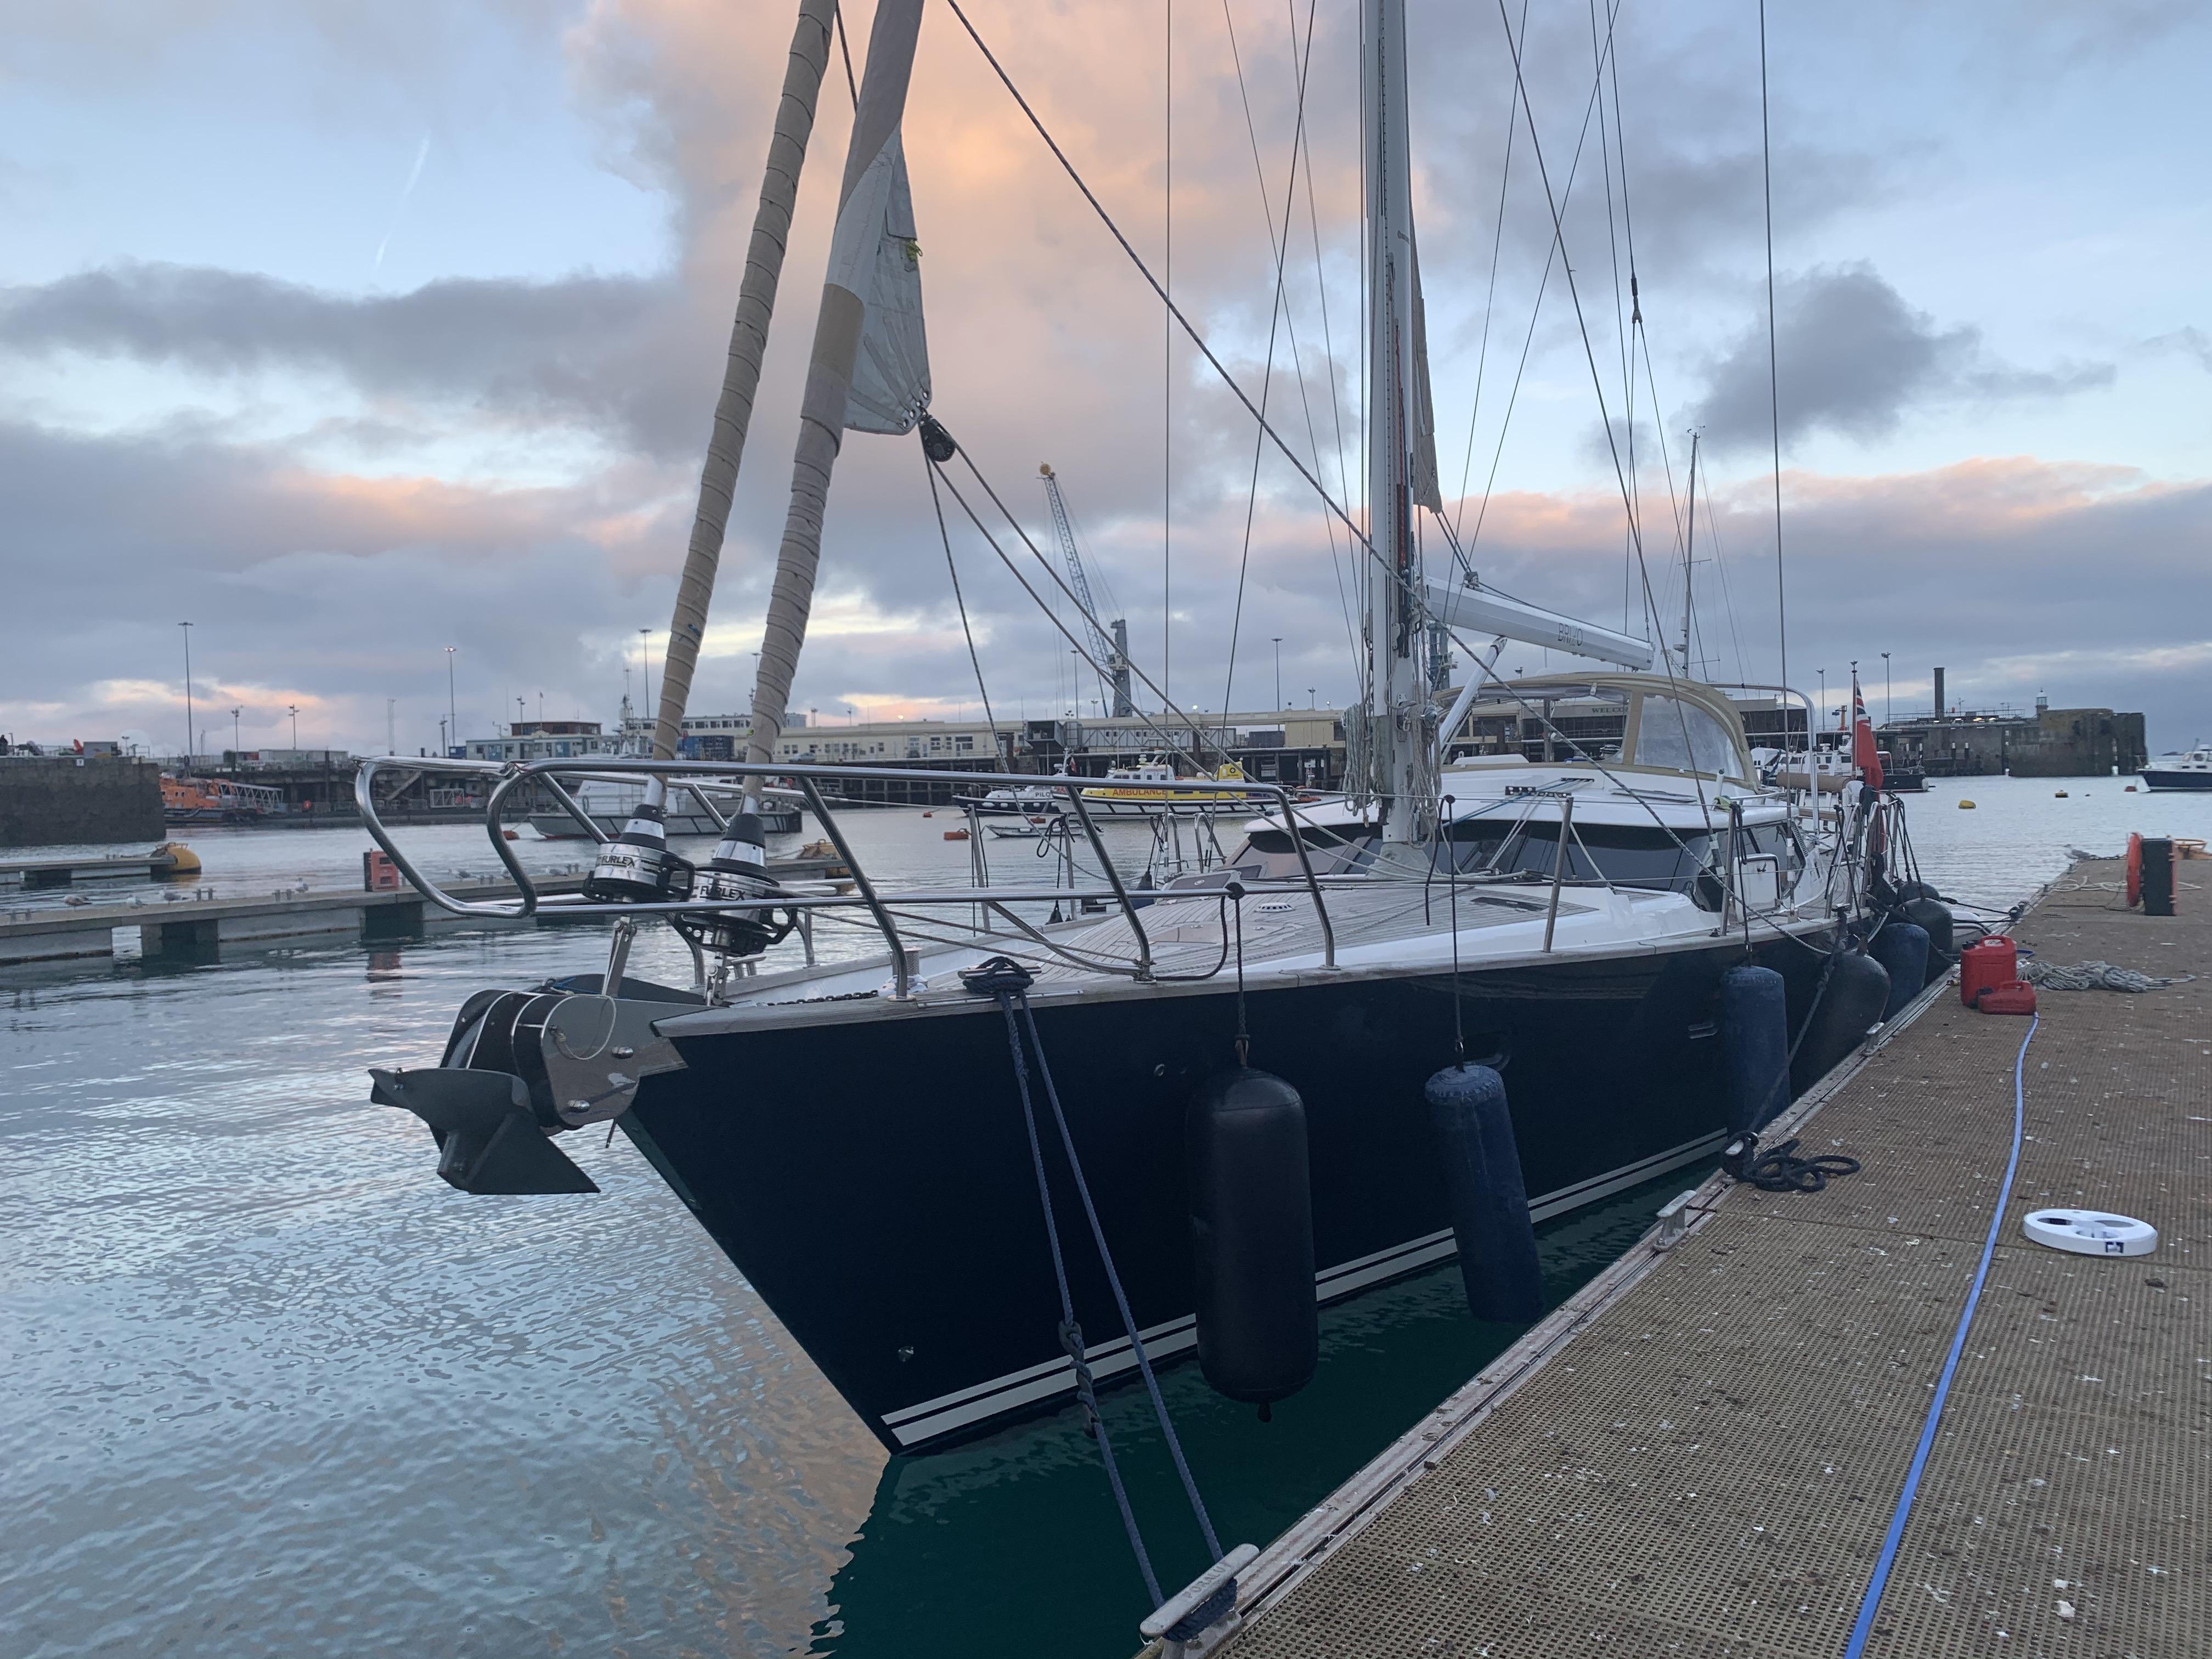 Brizo 55 in Guernsey